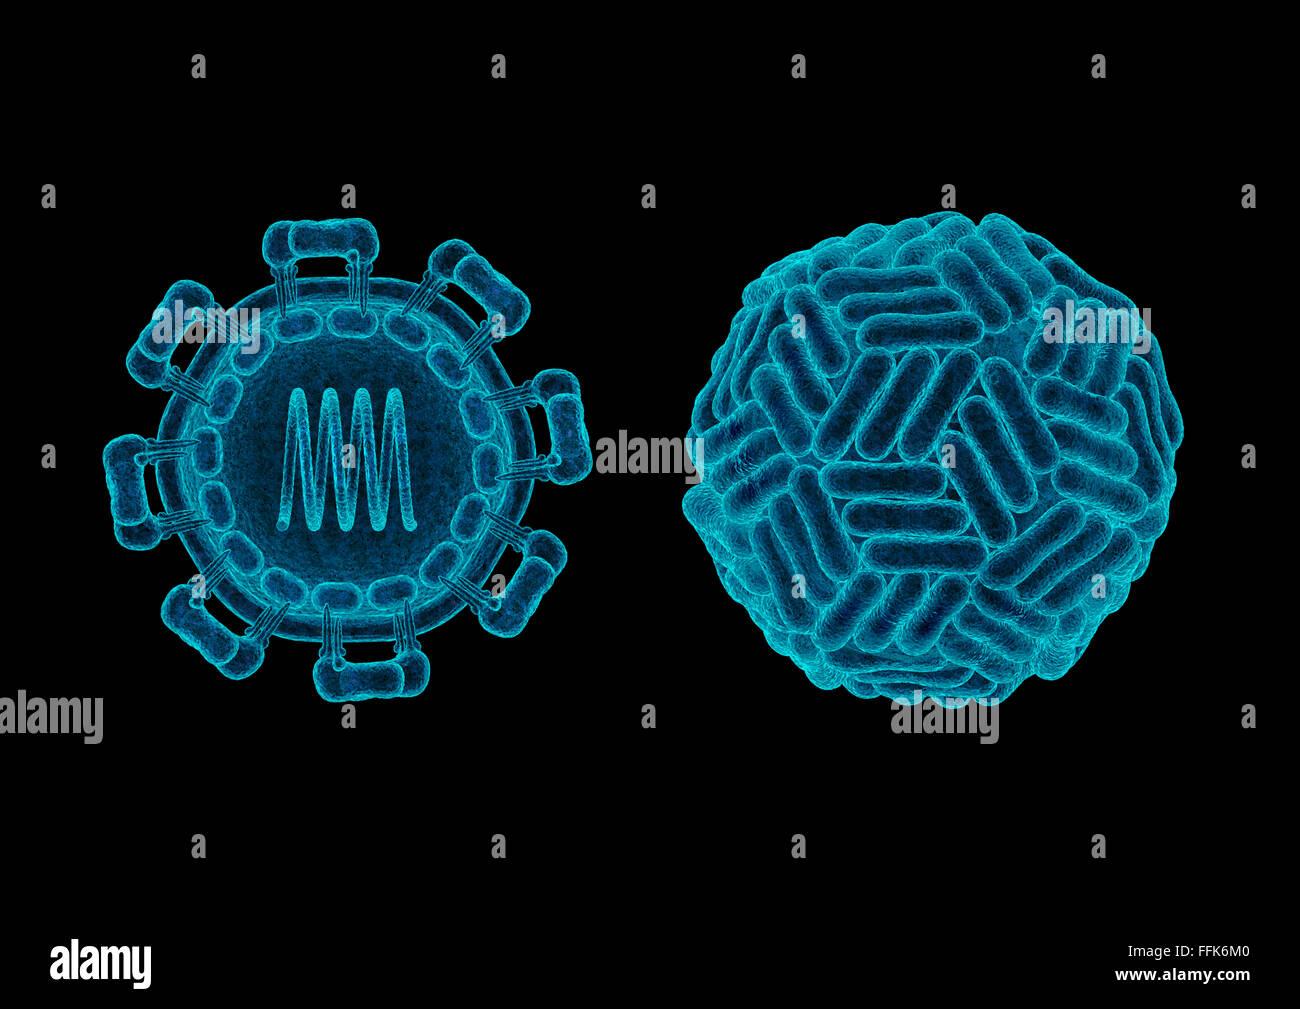 Zika virus structure concept / 3D render of Zika virus (ZIKV) showing distinct 3-like organisation of surface dimers - Stock Image